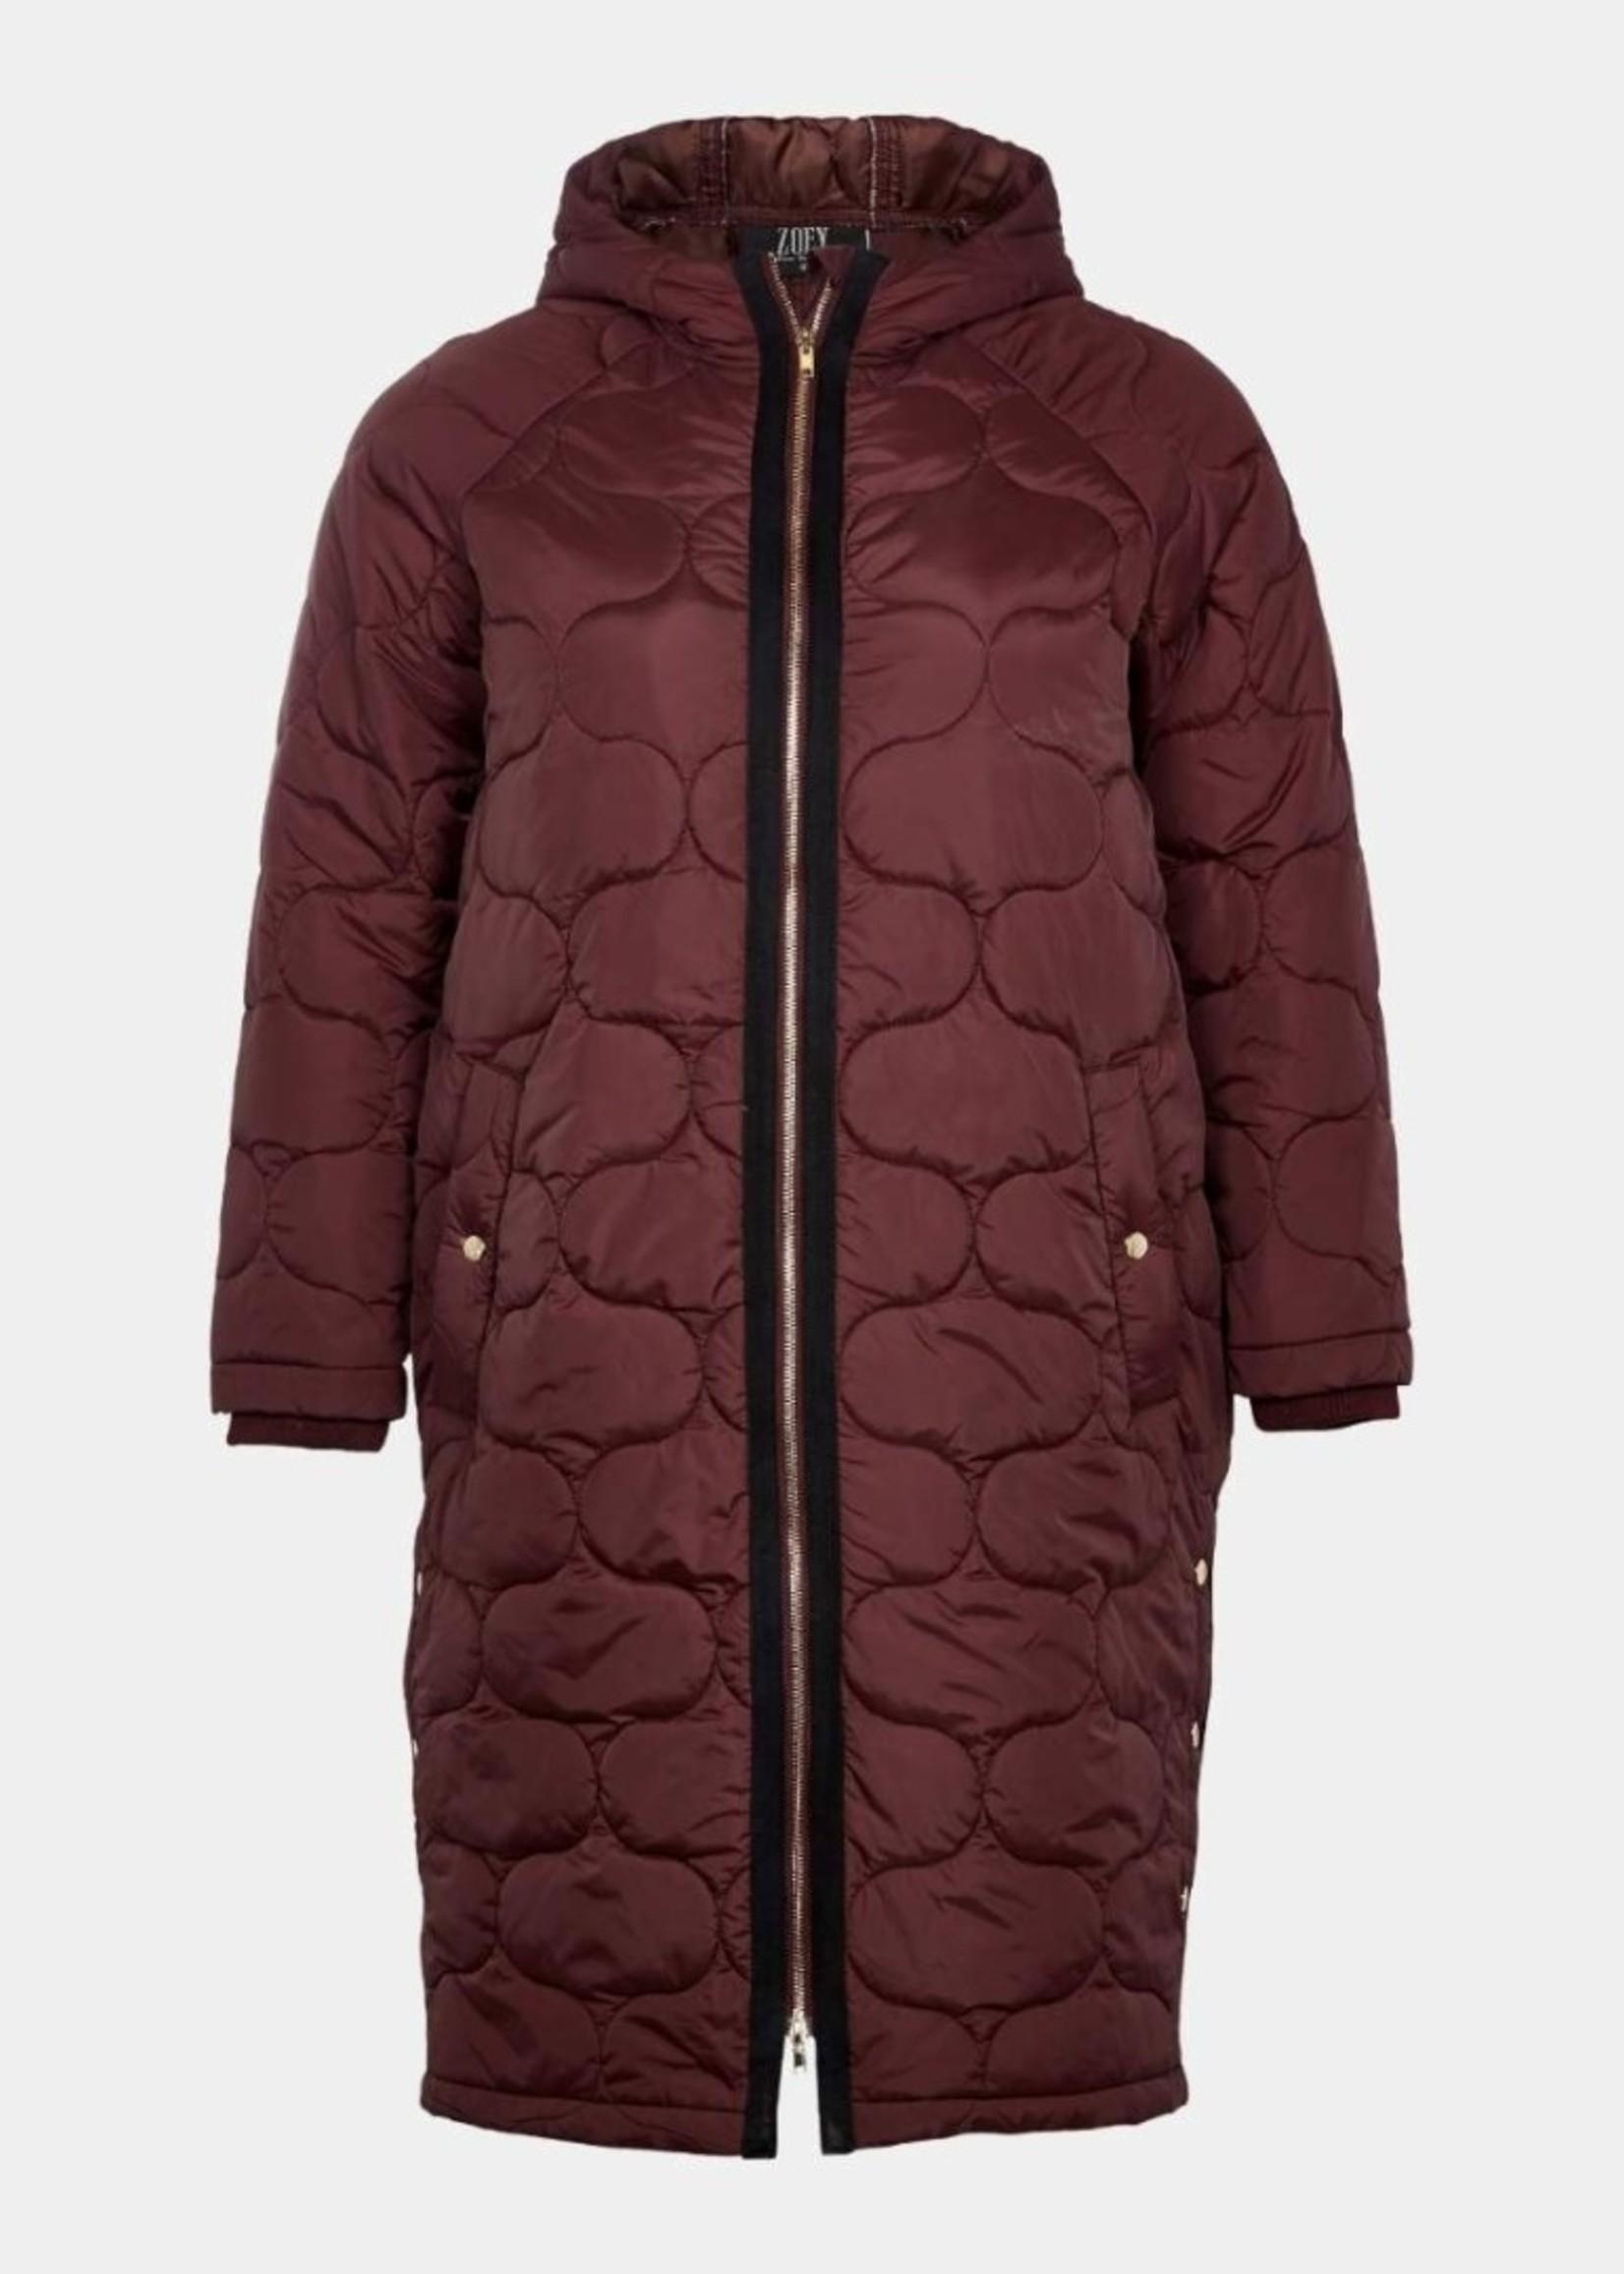 Zoey Zoey Leah Long Jacket